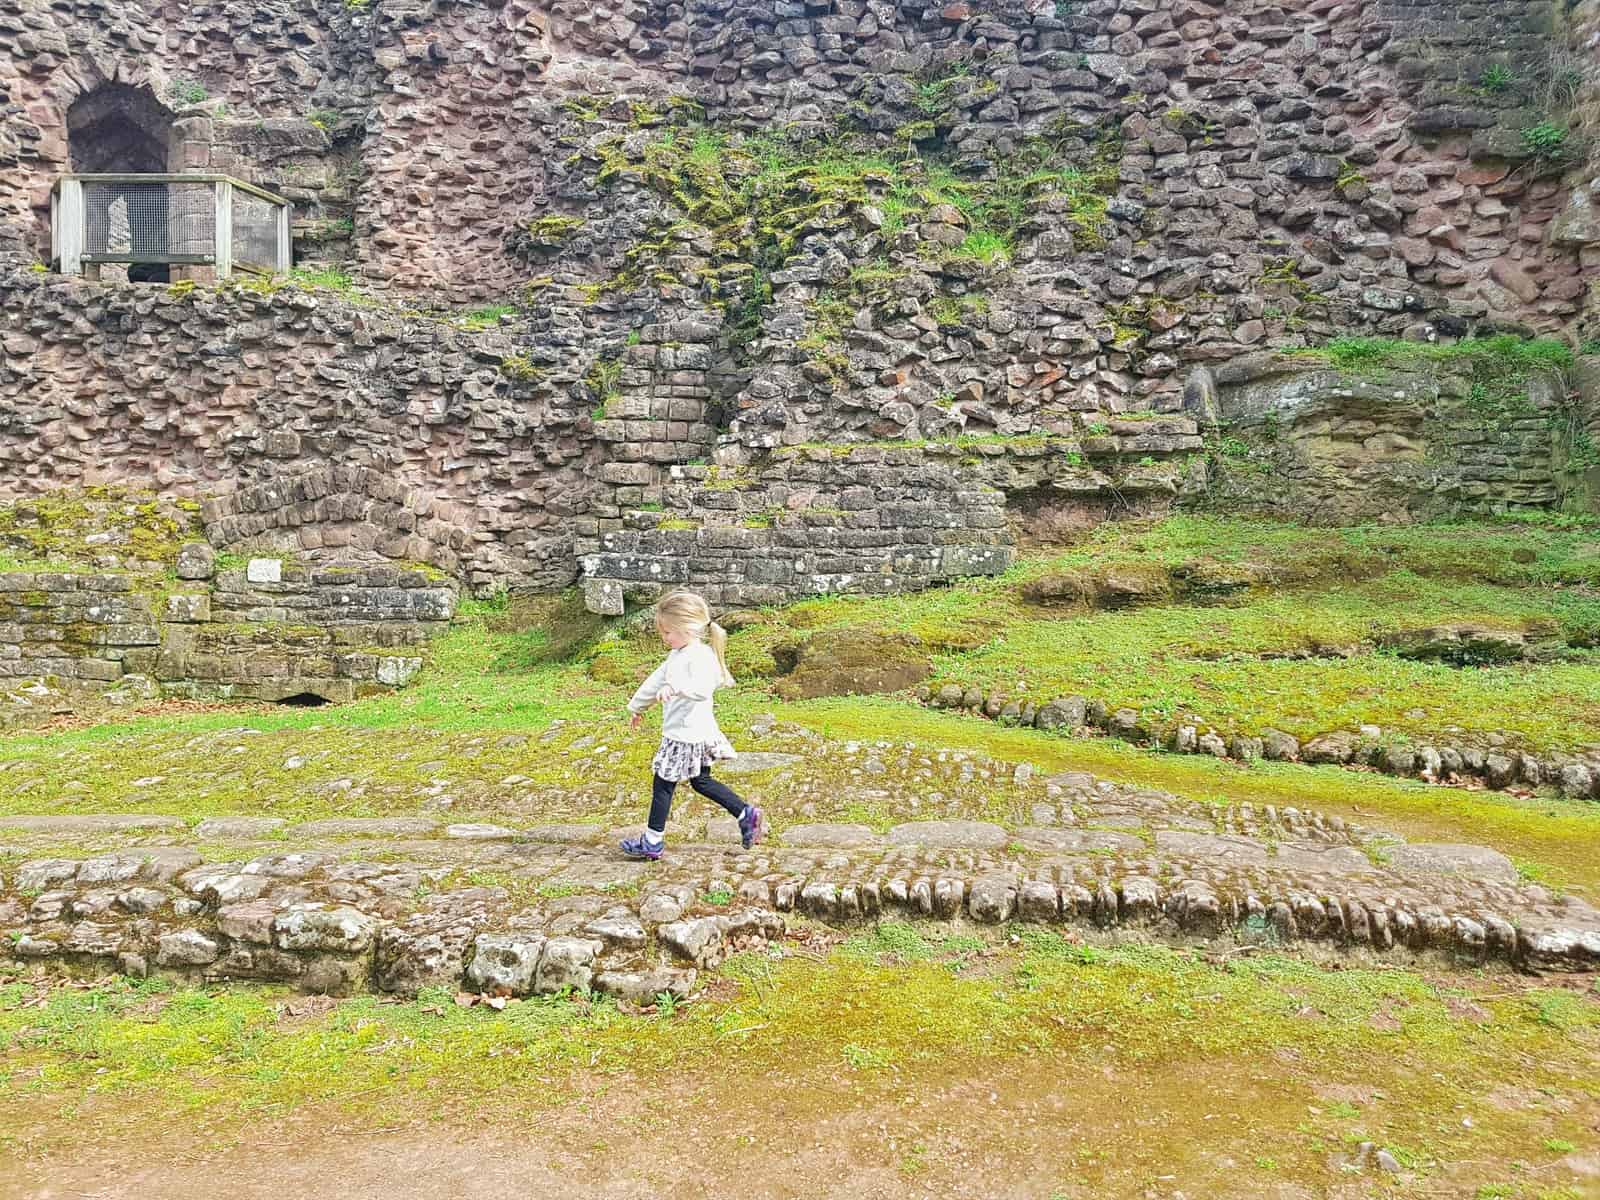 Little girl running through ruins of stables at Goodrich Castle